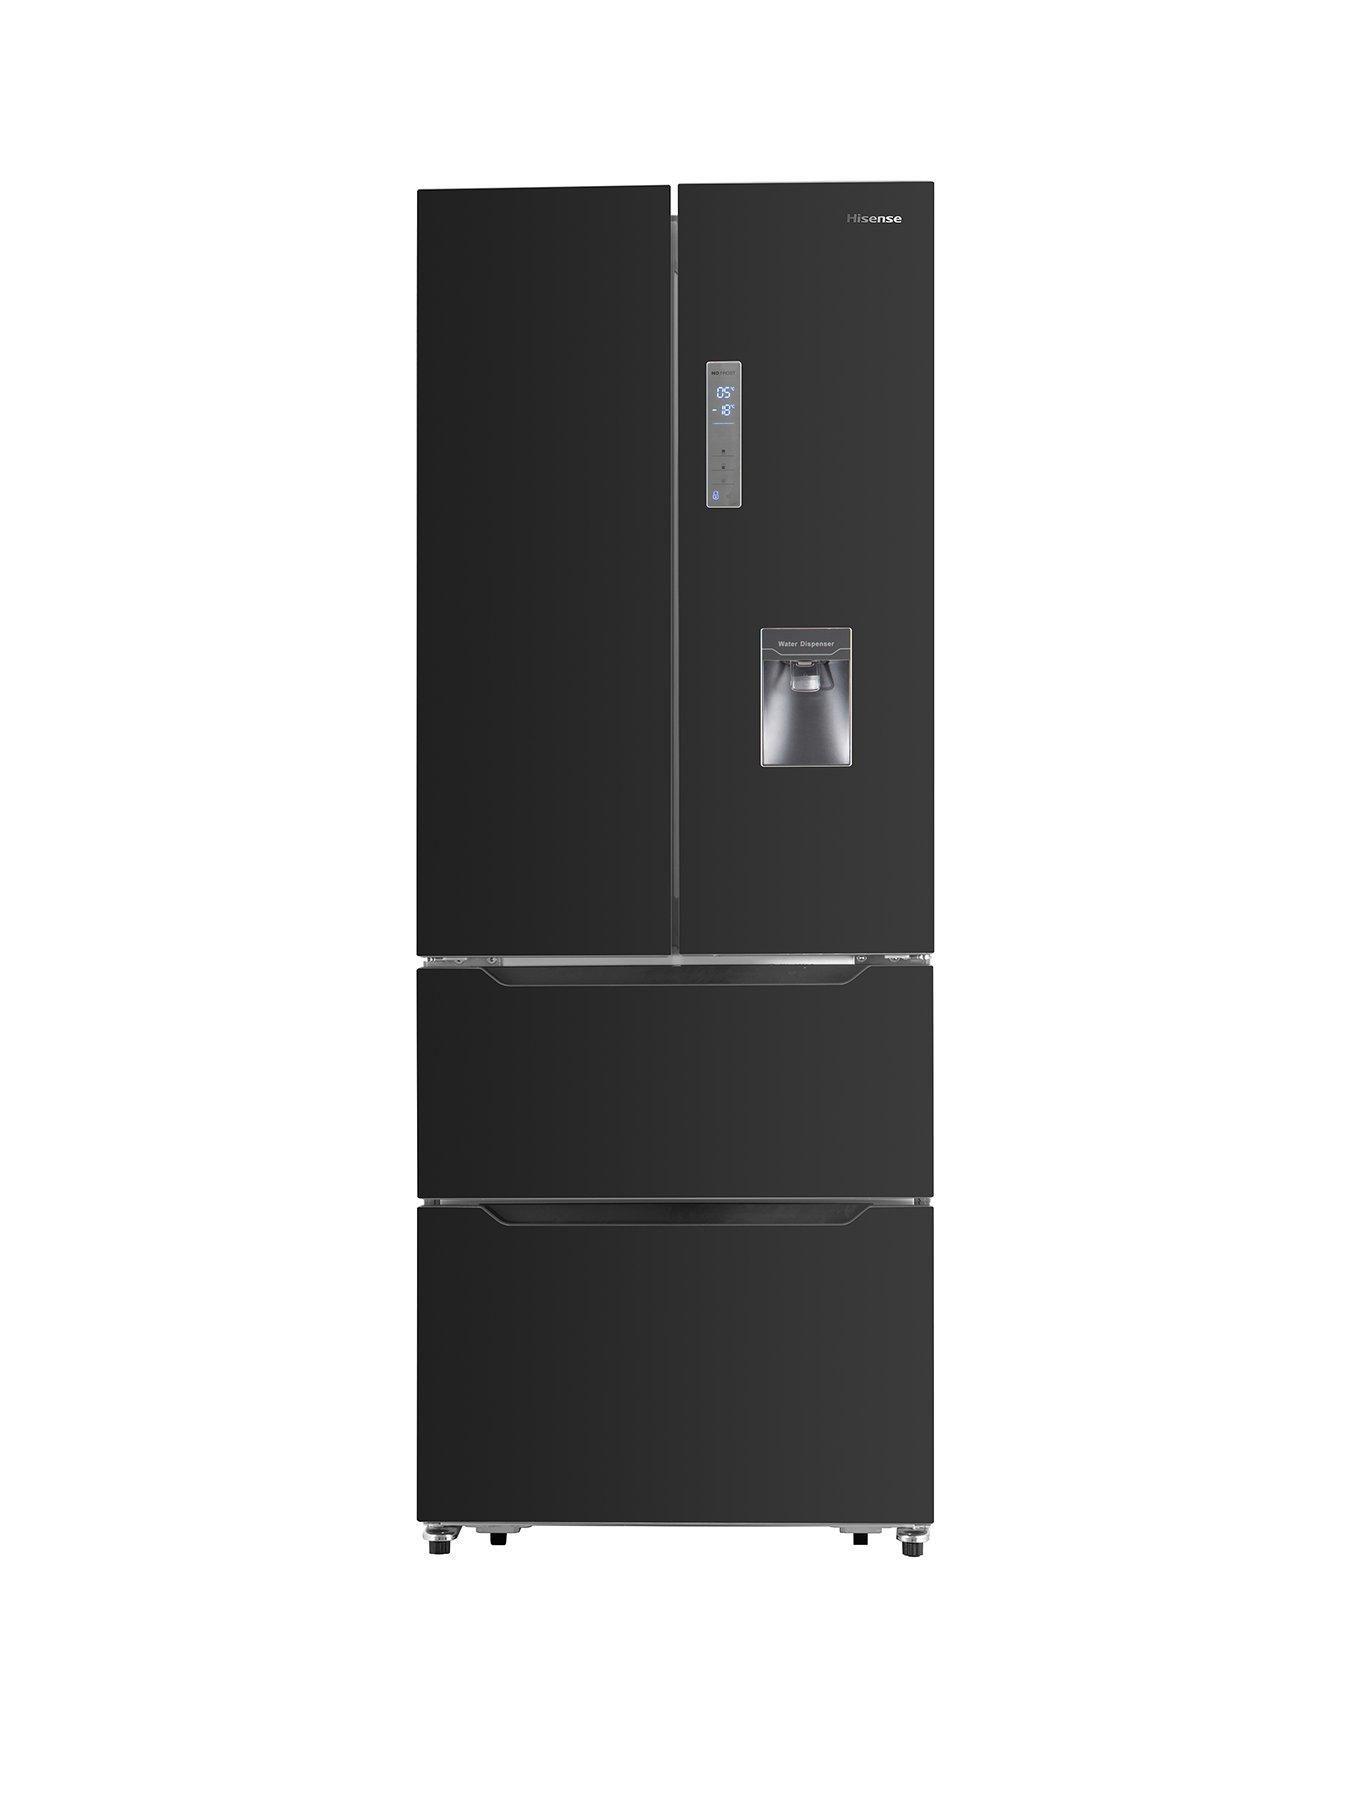 Rf528n4wb1 70cm Wide French Door Style Fridge Freezer With Water Dispenser Black Water Dispenser Locker Storage French Doors